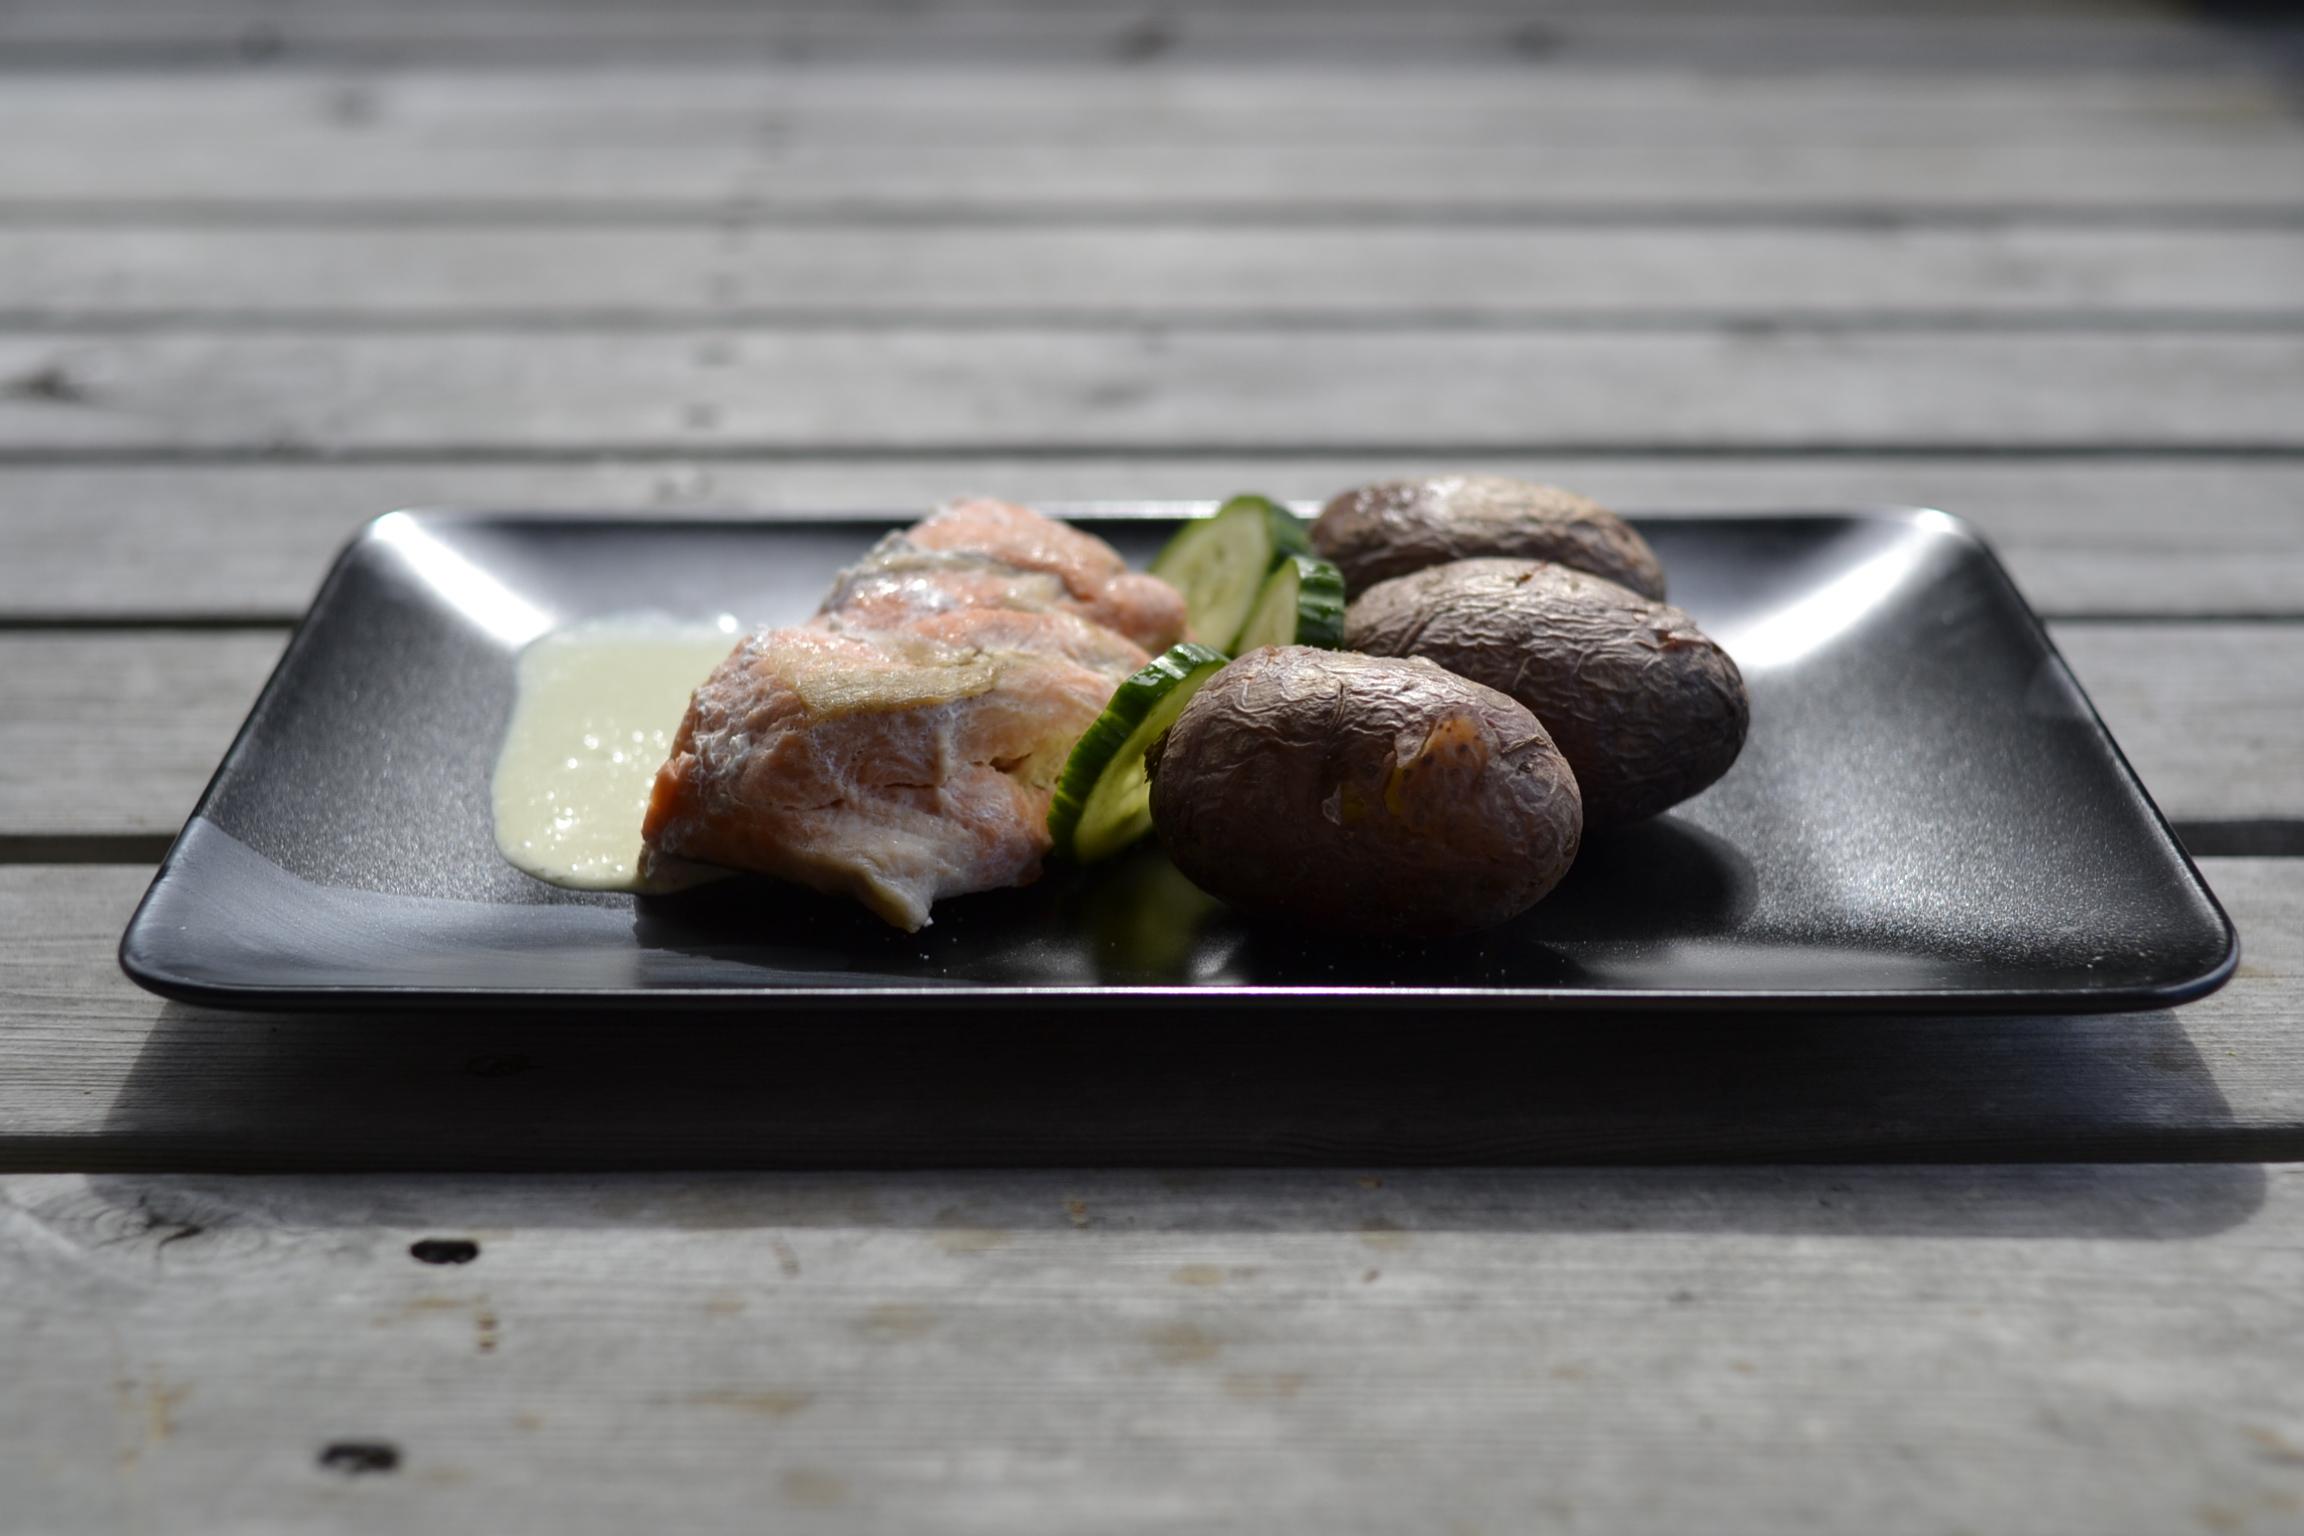 salmone norvegese con salsa verde al tè matcha